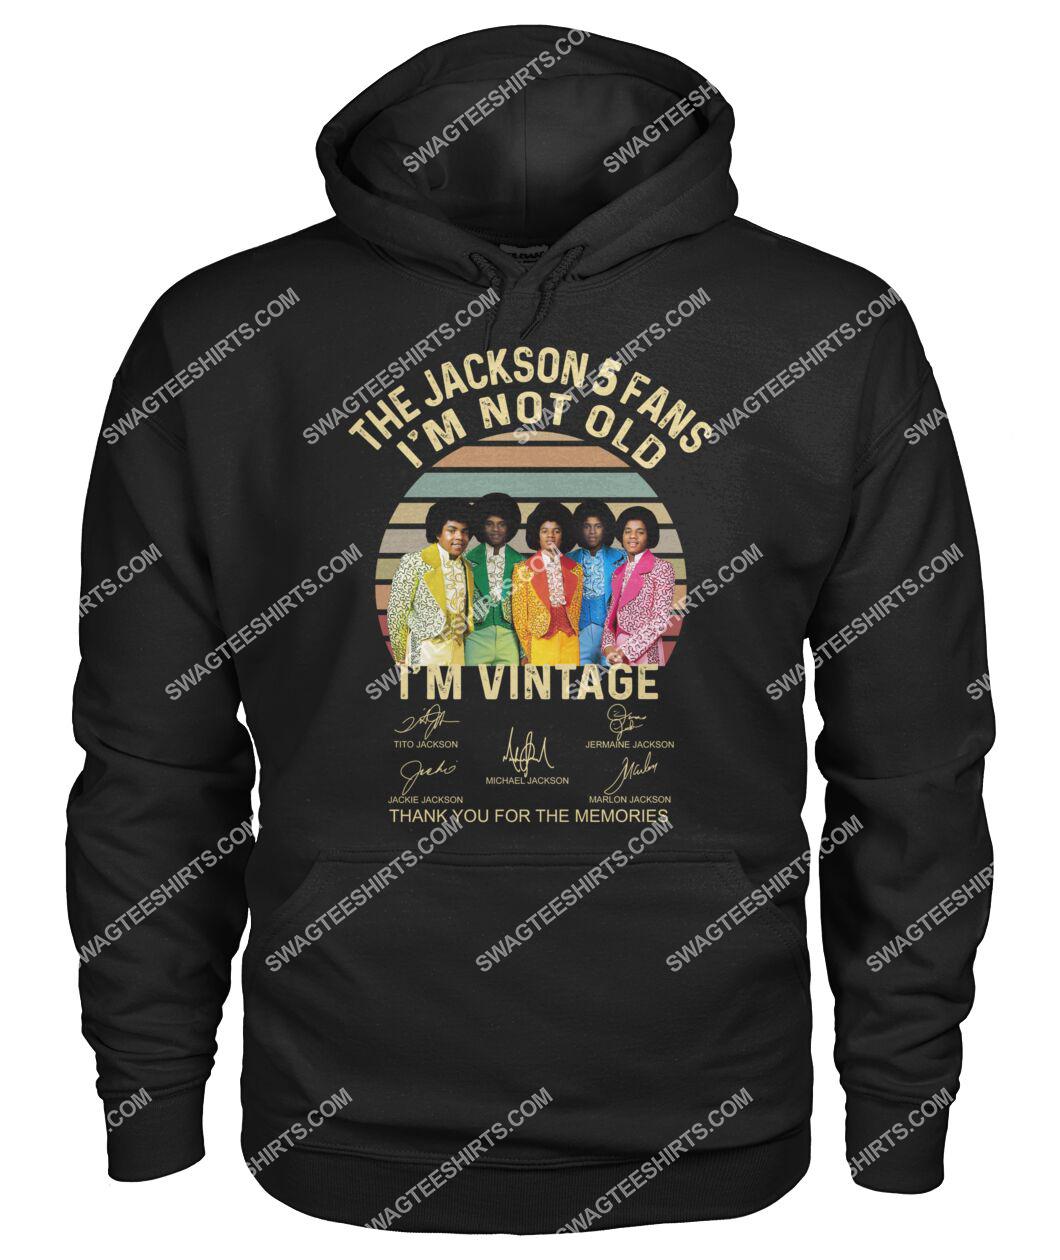 the jackson 5 fans i'm not old i'm vintage hoodie 1